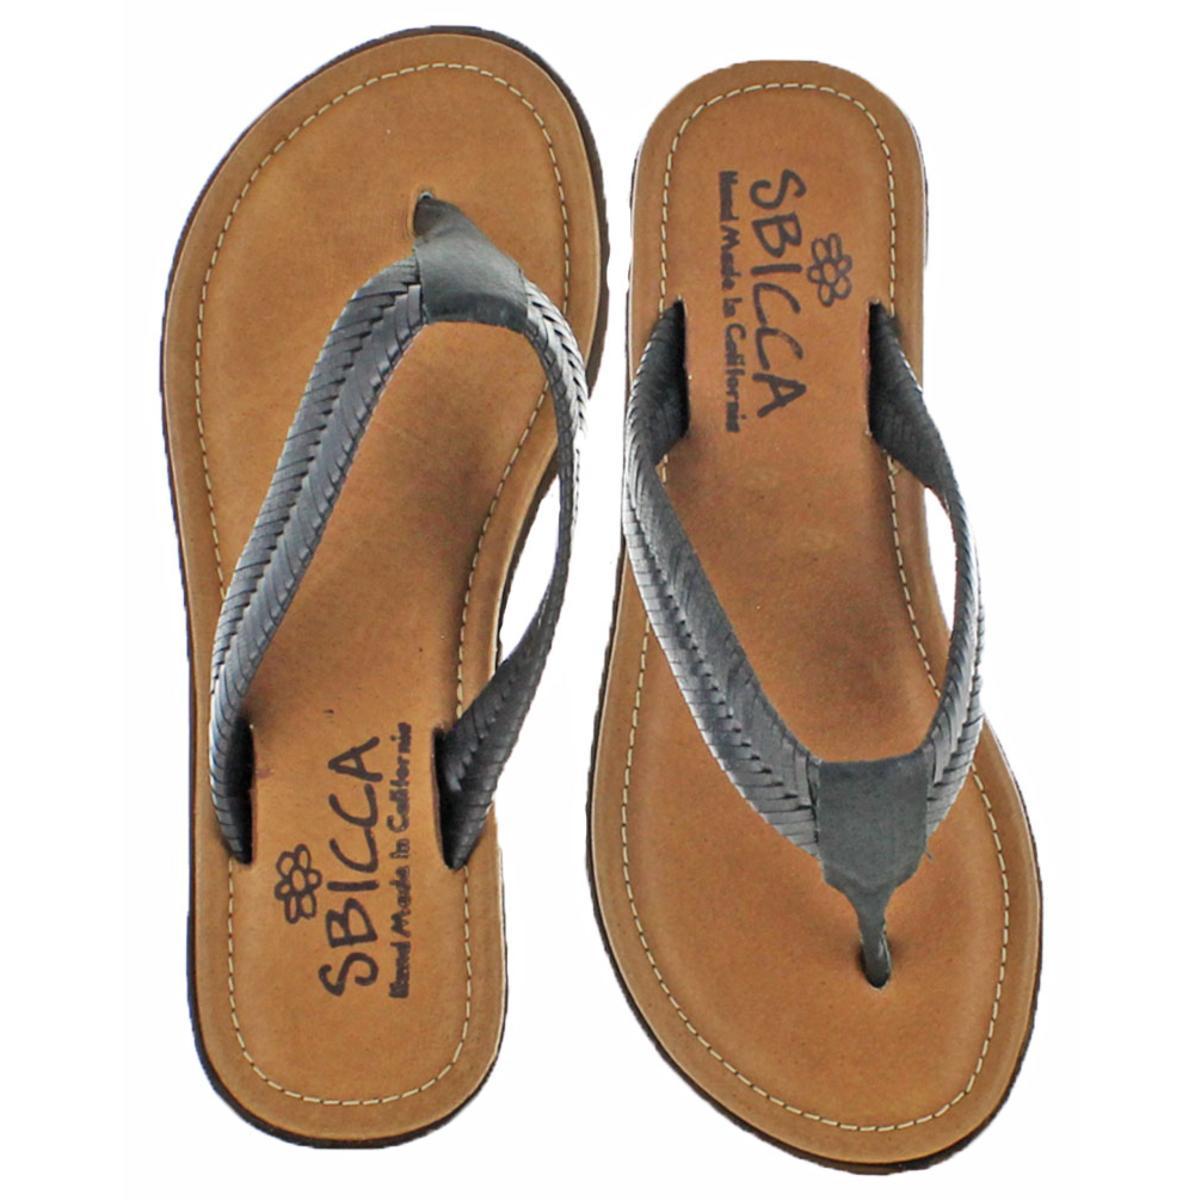 ca359ae3be0376 Buy Sbicca Womens Elonara Black Woven Thong Sandals Shoes 8 Medium ...